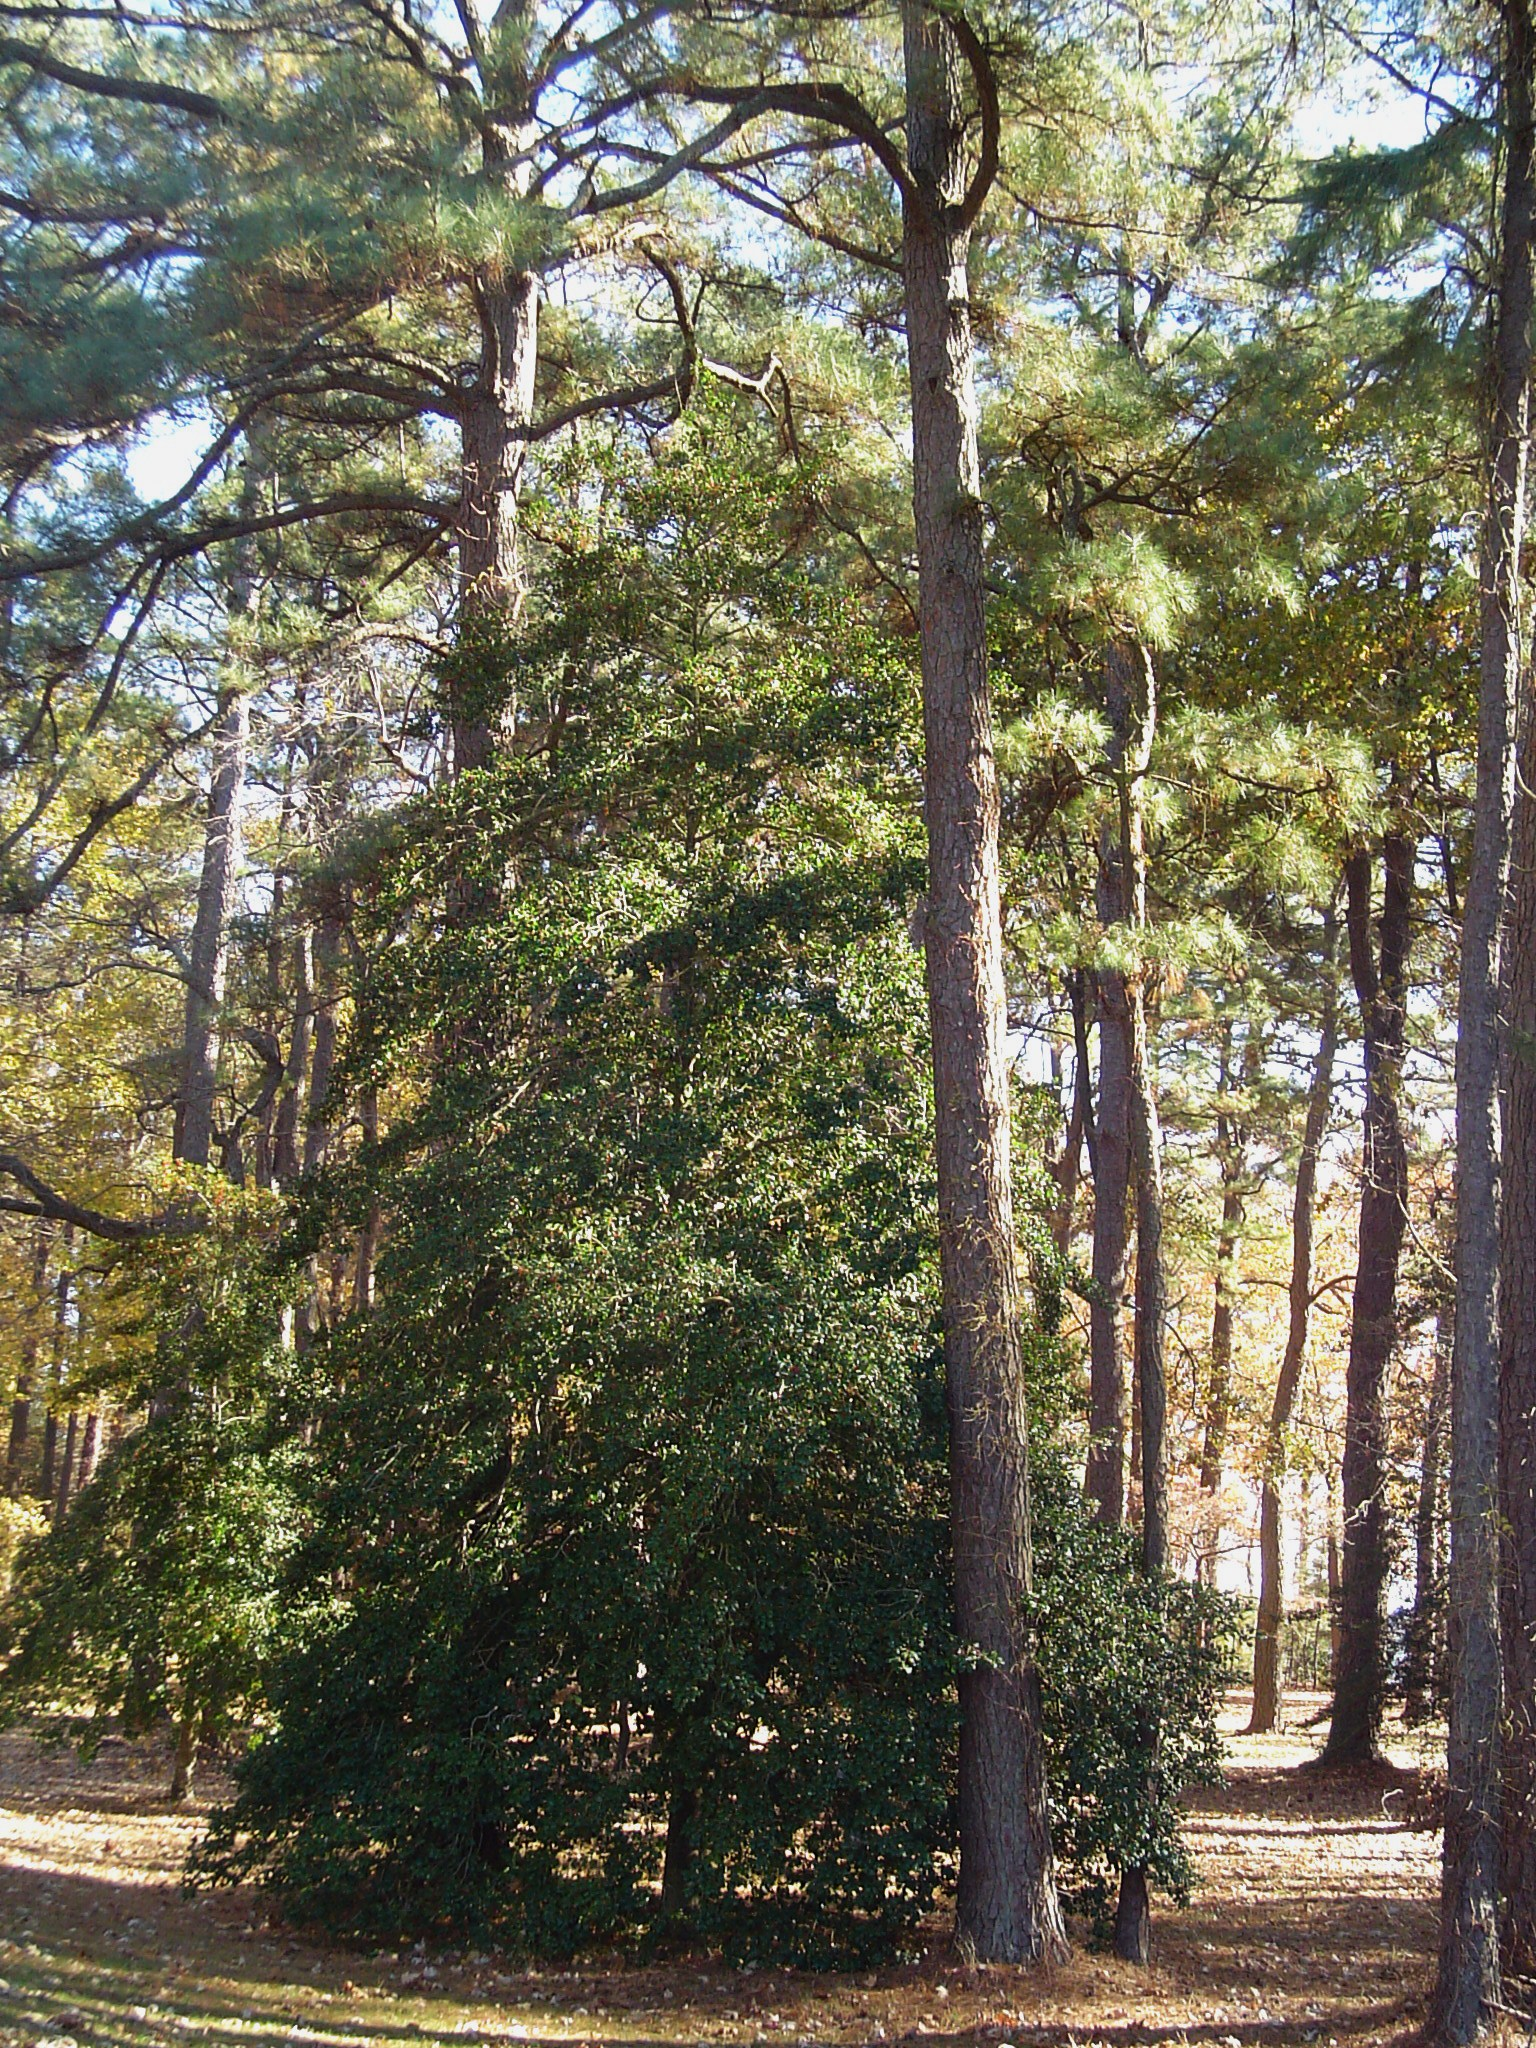 Trees Of The Oregon Garden: Forest Garden